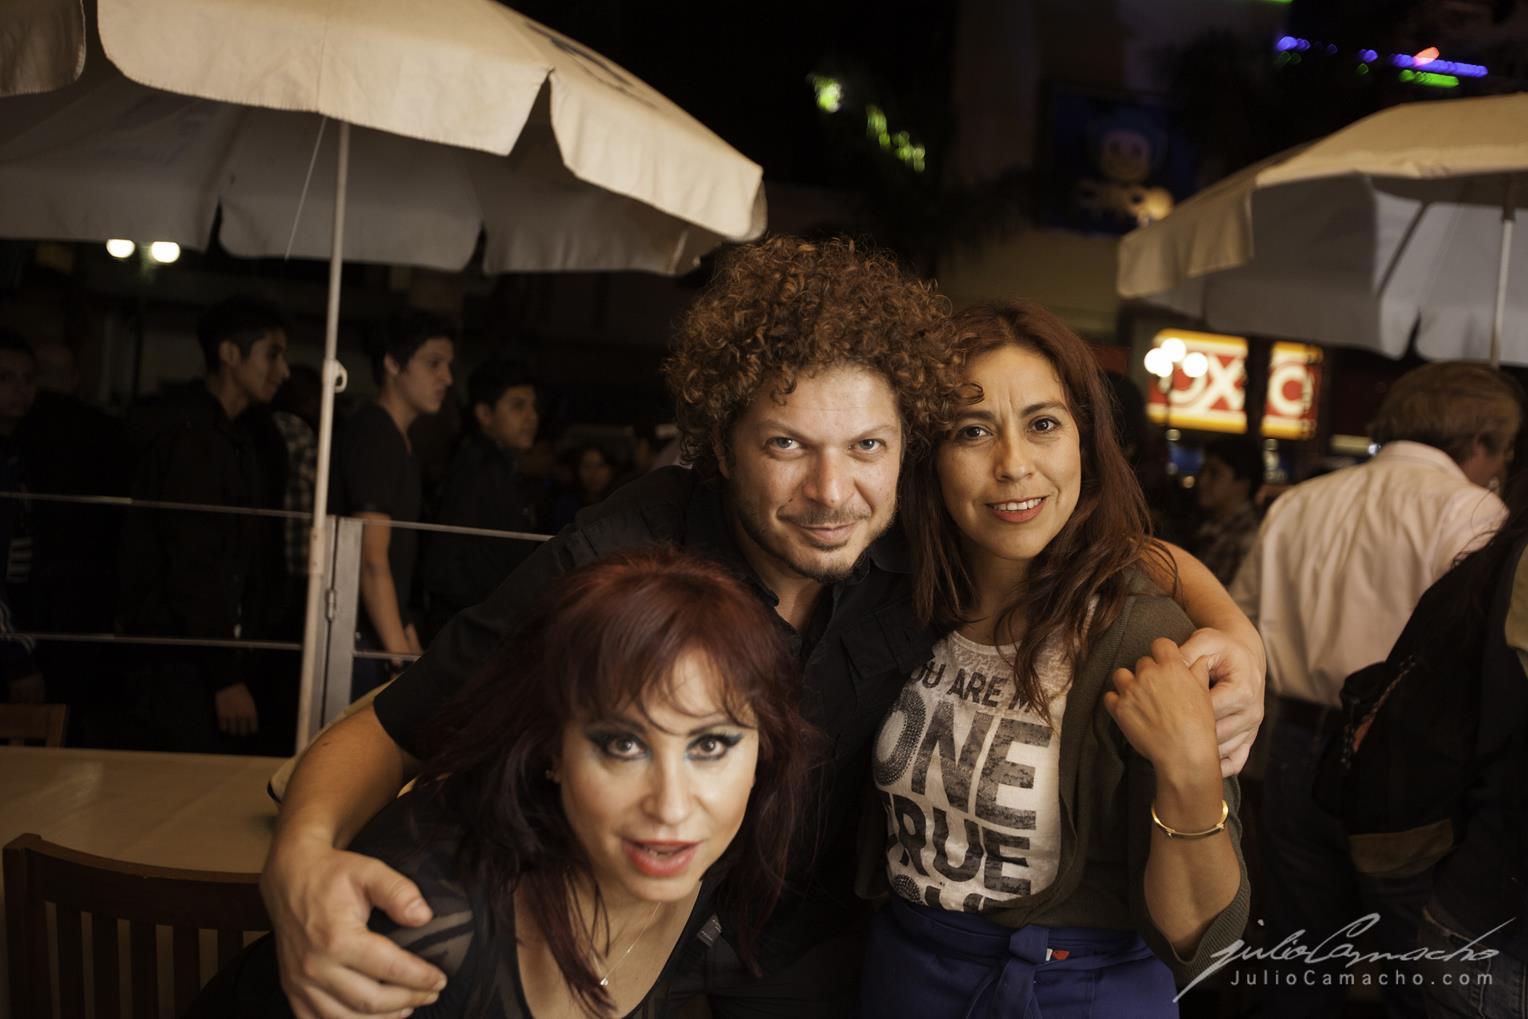 2014-10-30 31 CAST TOUR Ensenada y Tijuana - 1840 - www.Juli (Copy).jpg